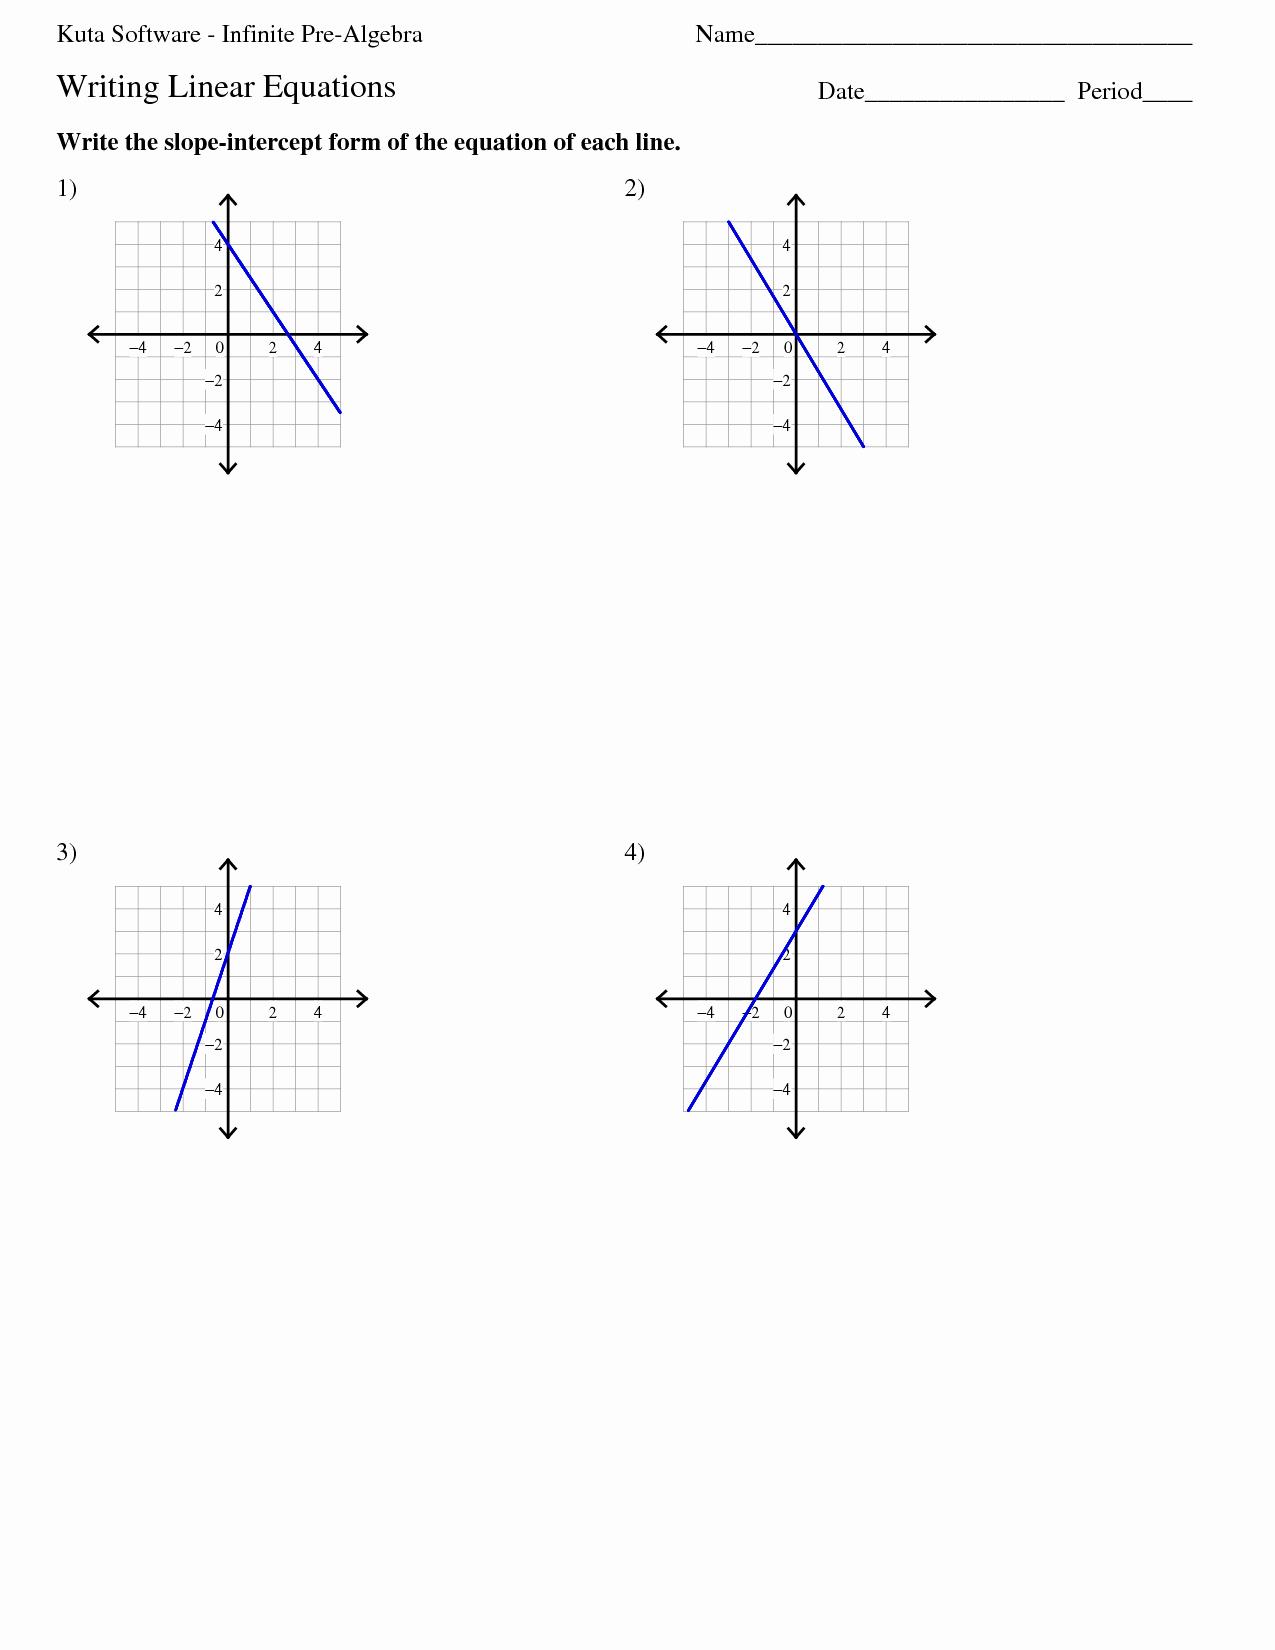 Writing Linear Equations Worksheet Answers Beautiful Algebra 1 Point Slope form Worksheet Key Point Slope